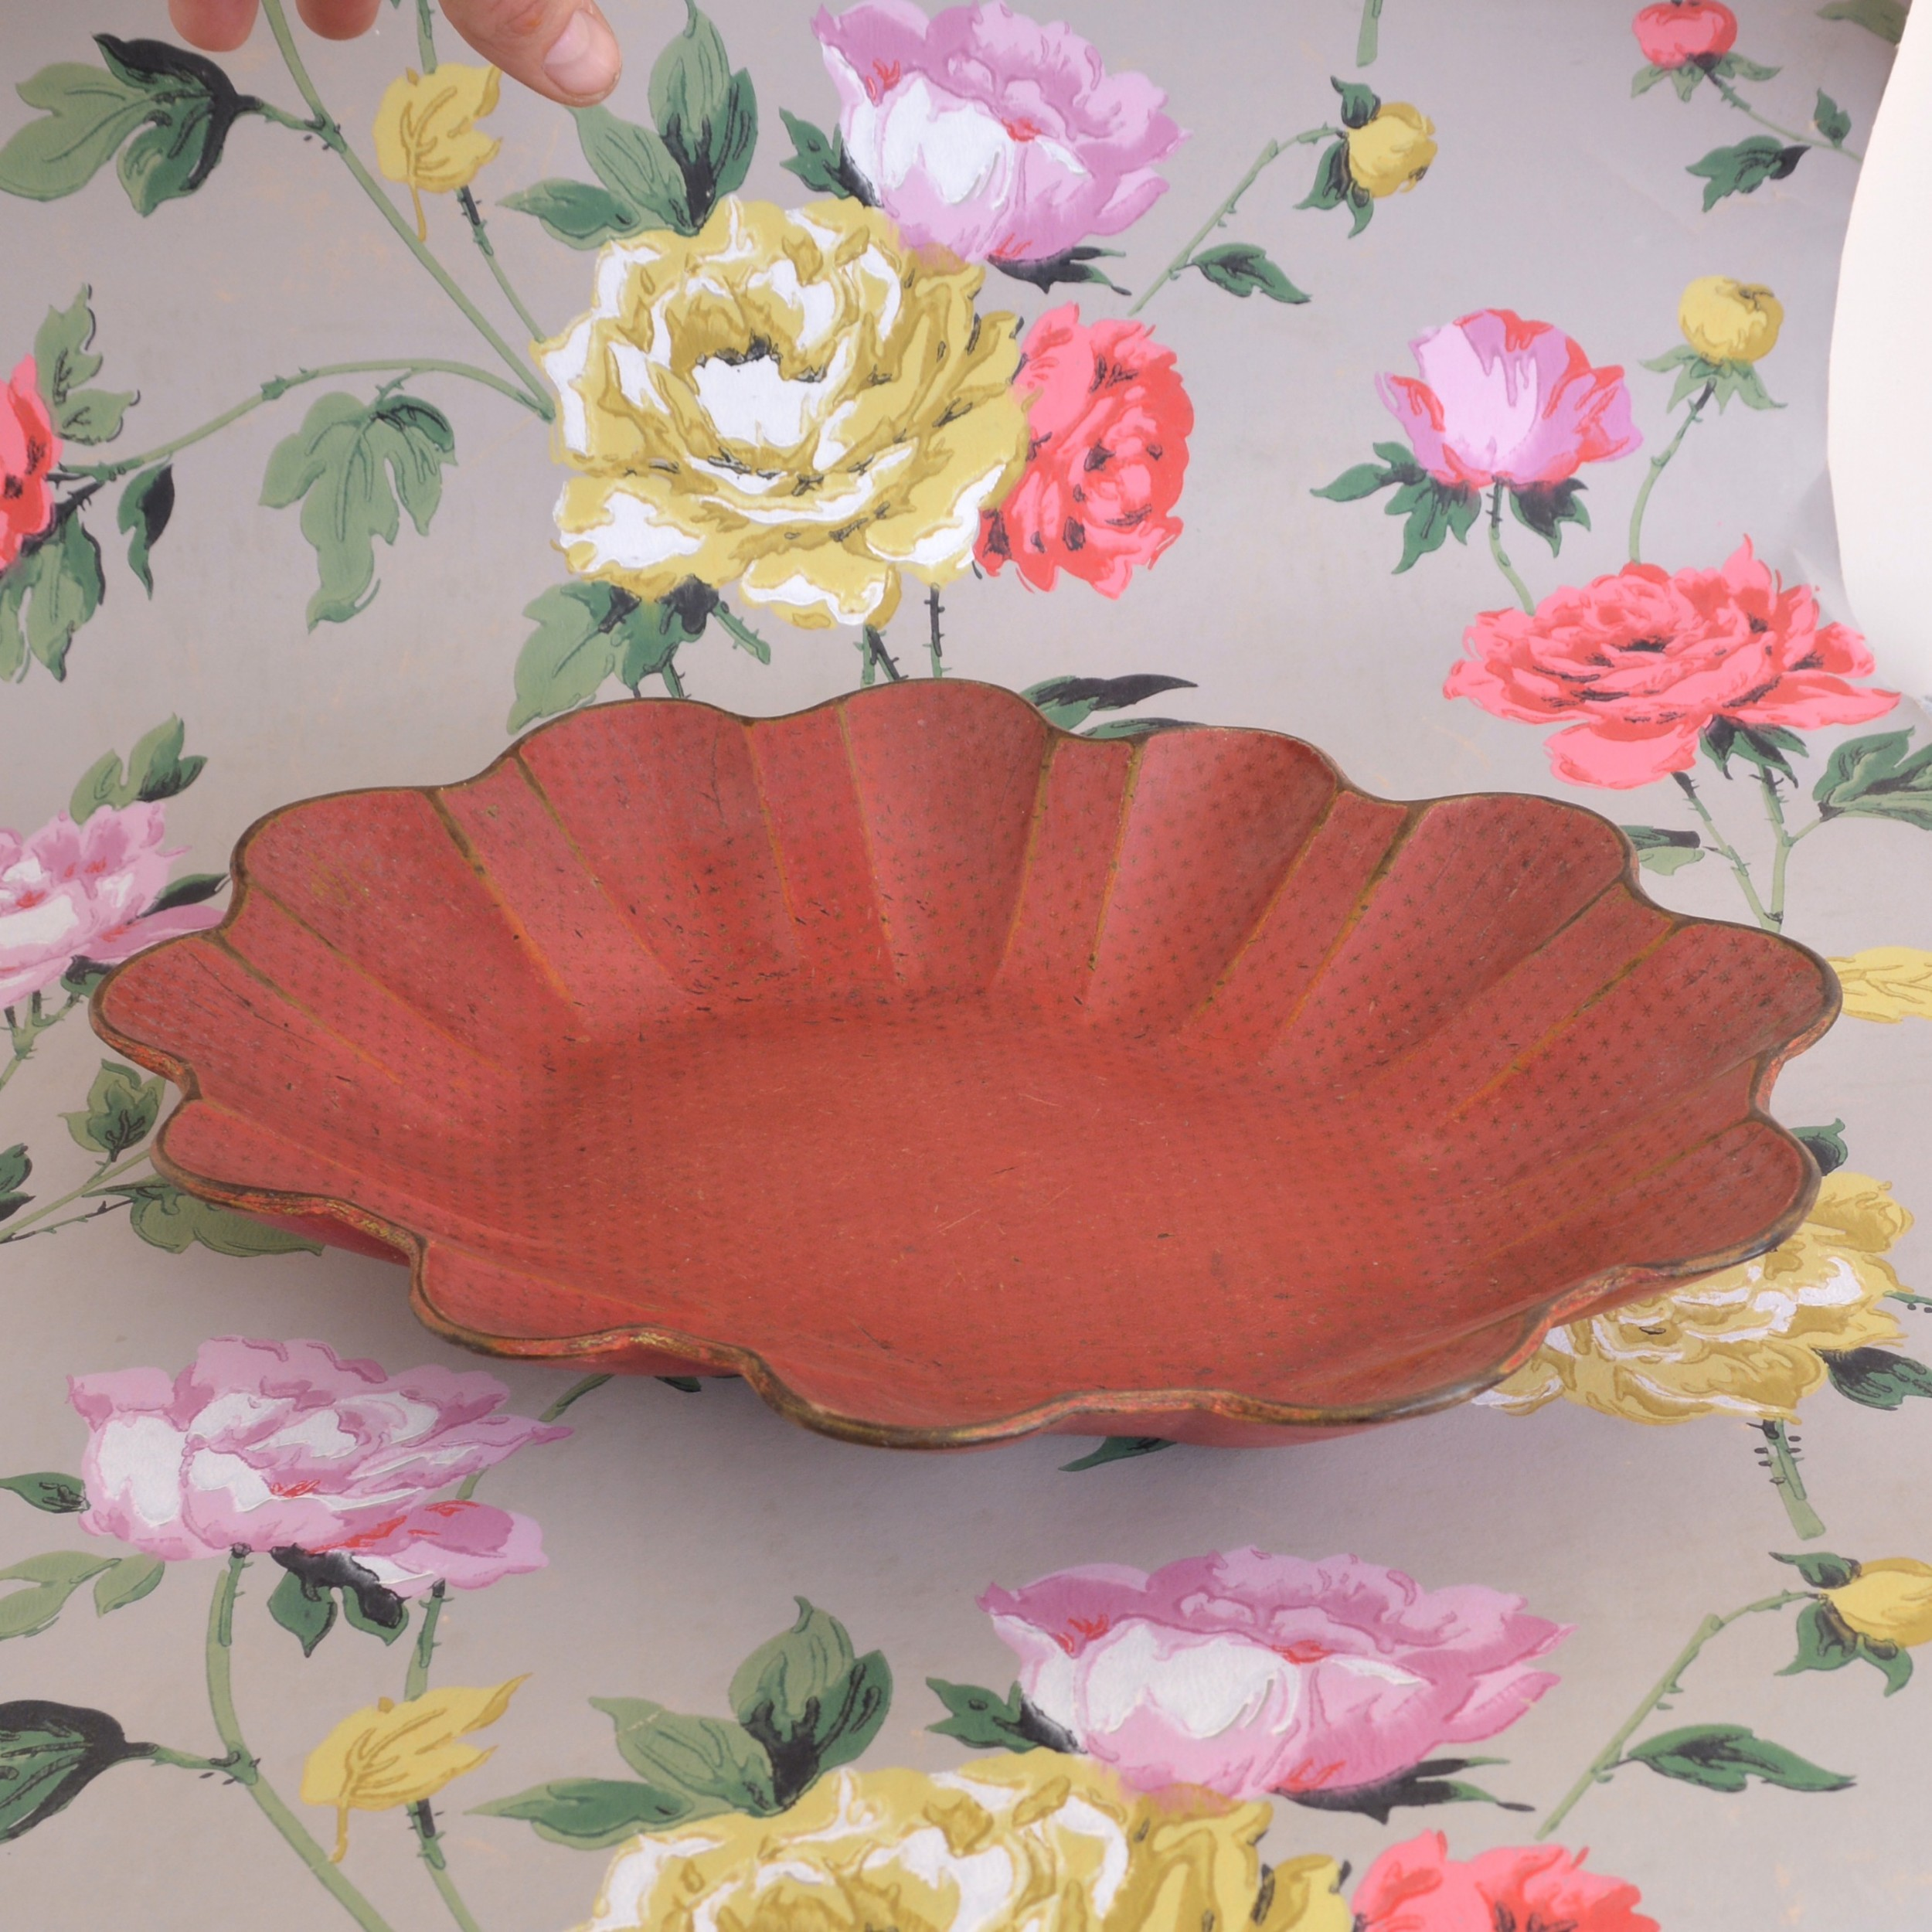 19th century red papiermch bowl